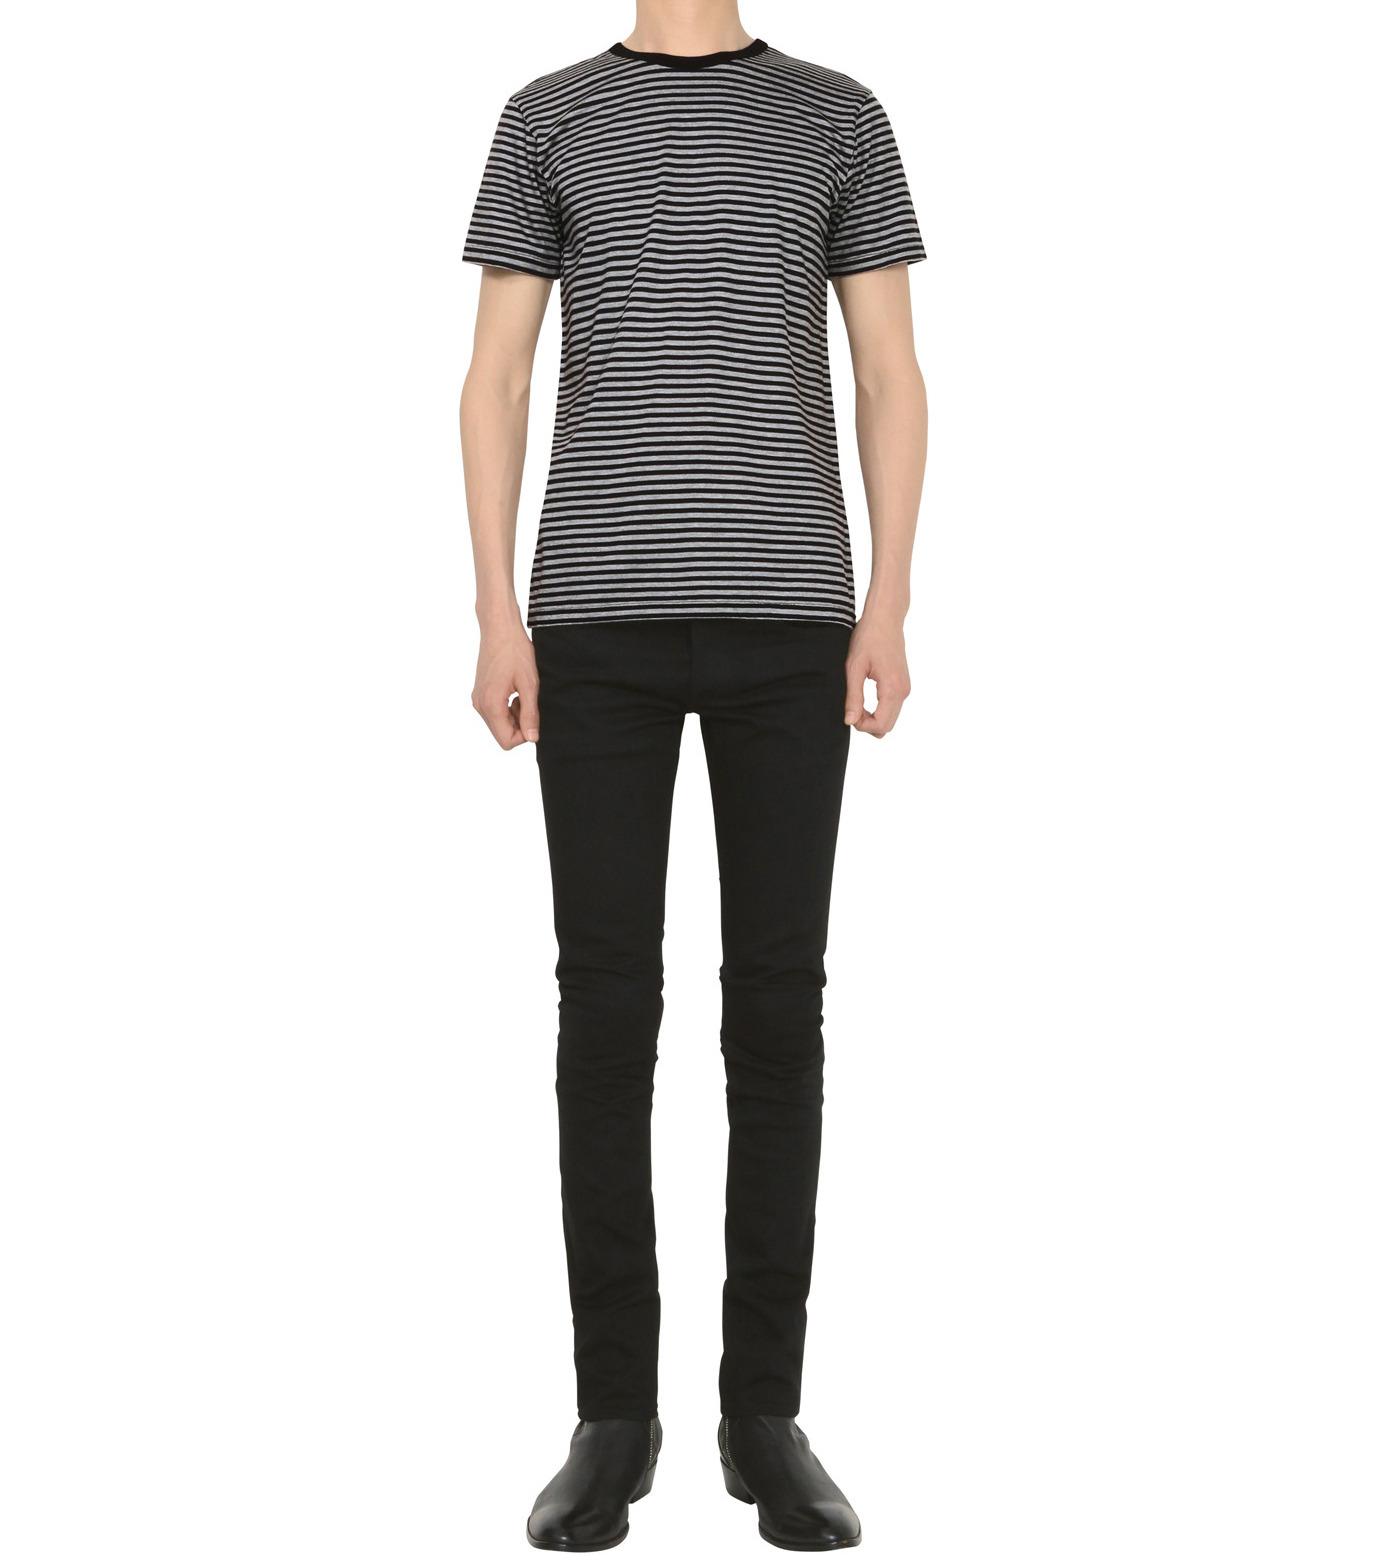 HL HEDDIE LOVU(エイチエル・エディールーヴ)のHL SUPER SLIM-BLACK(パンツ/pants)-18S98010-13 拡大詳細画像3